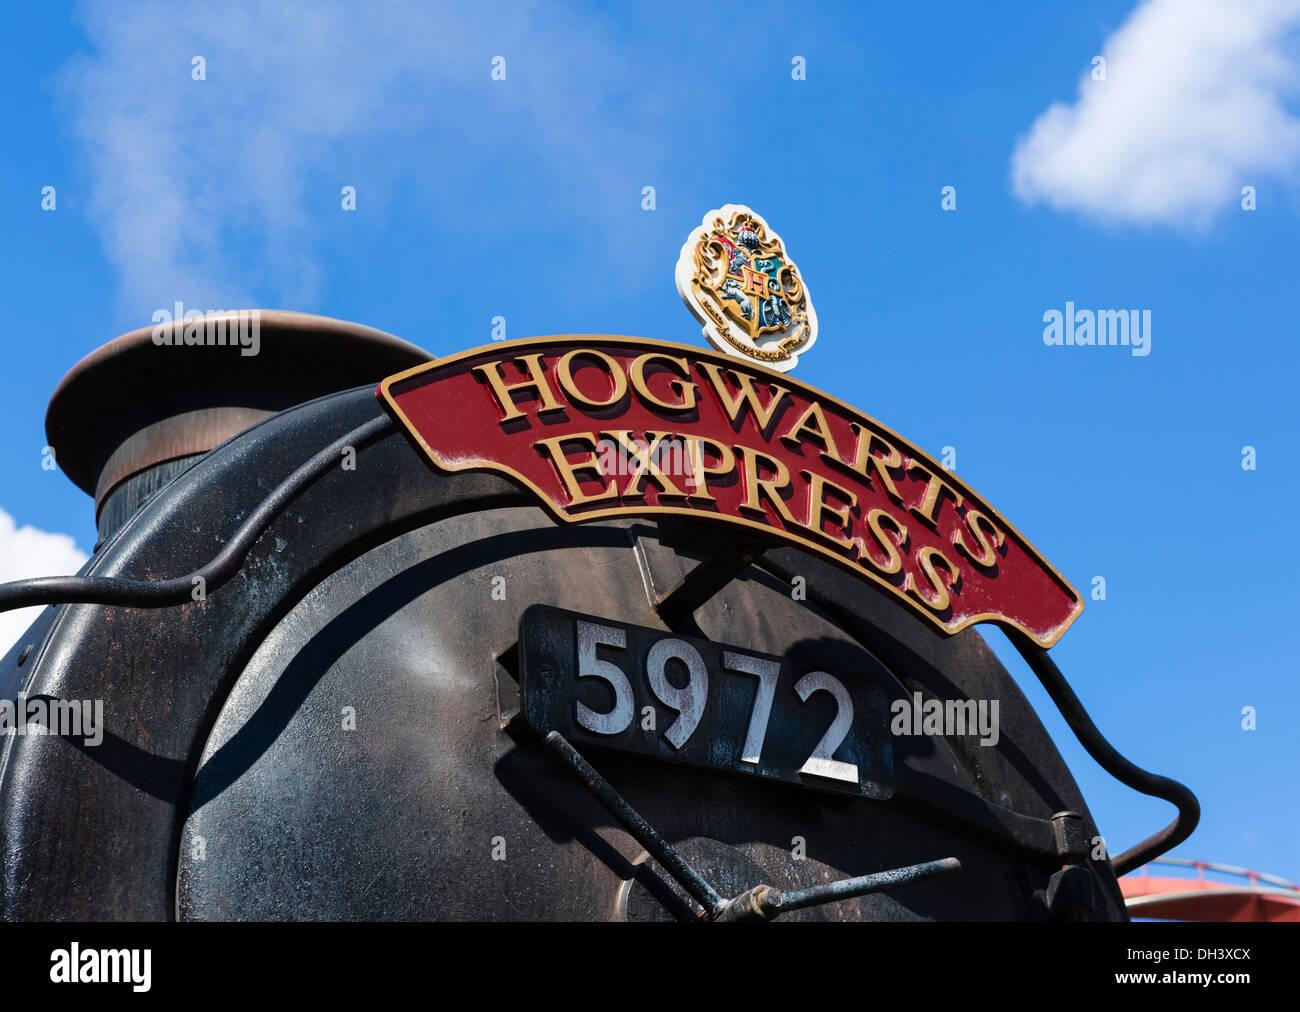 Hogwarts Express train in Wizarding World of Harry Potter, Islands of Adventure, Universal Orlando Resort, Orlando, - Stock Image